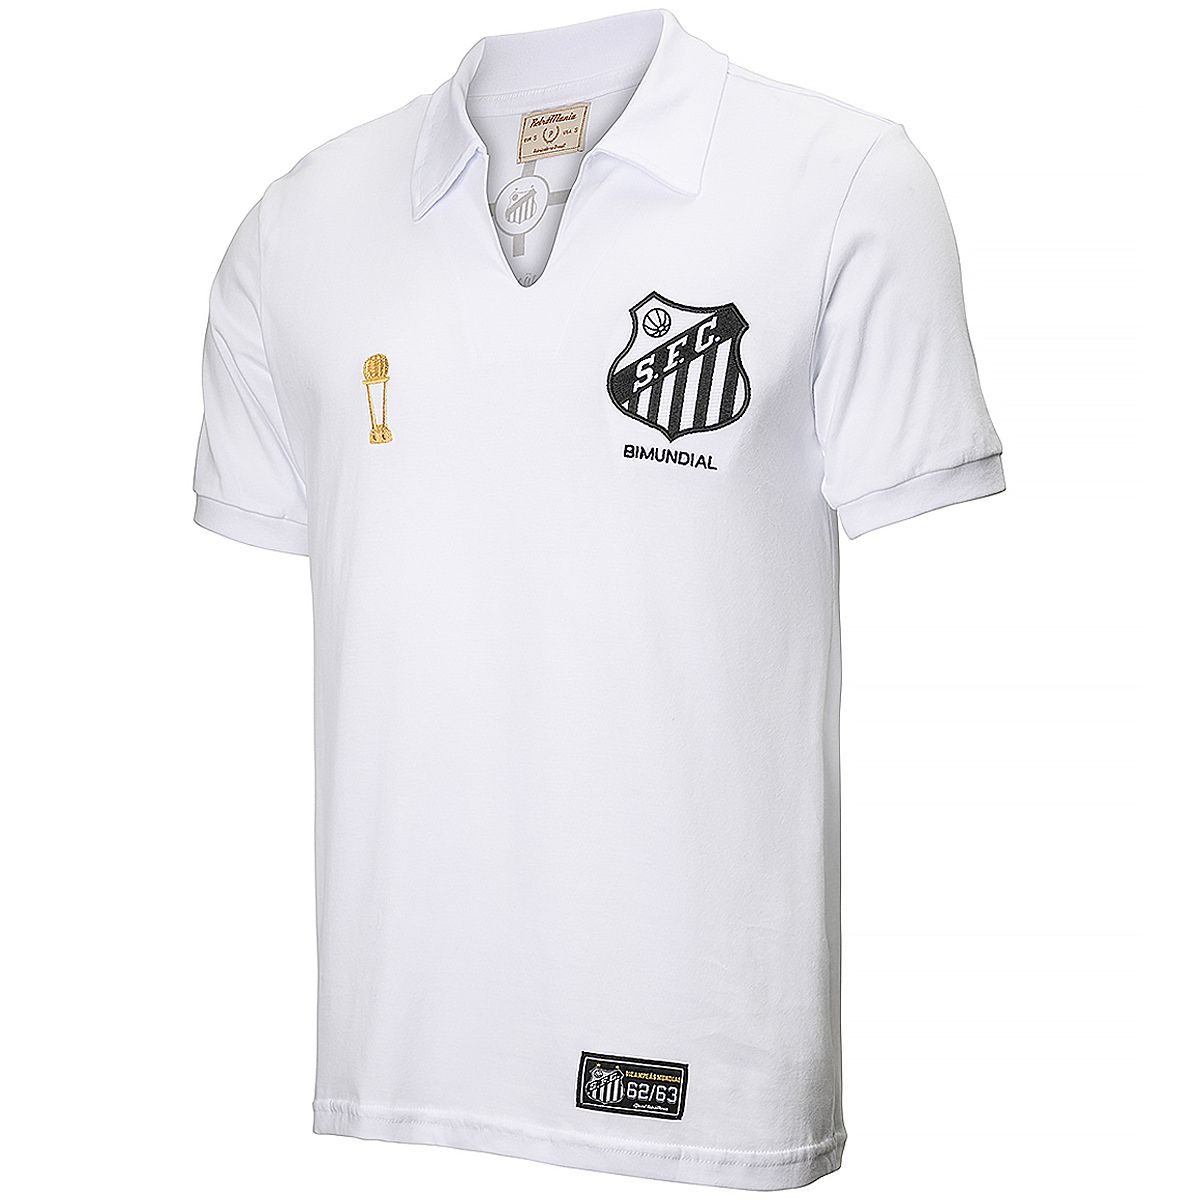 Camisa Santos Retrô Bicampeão 62/63